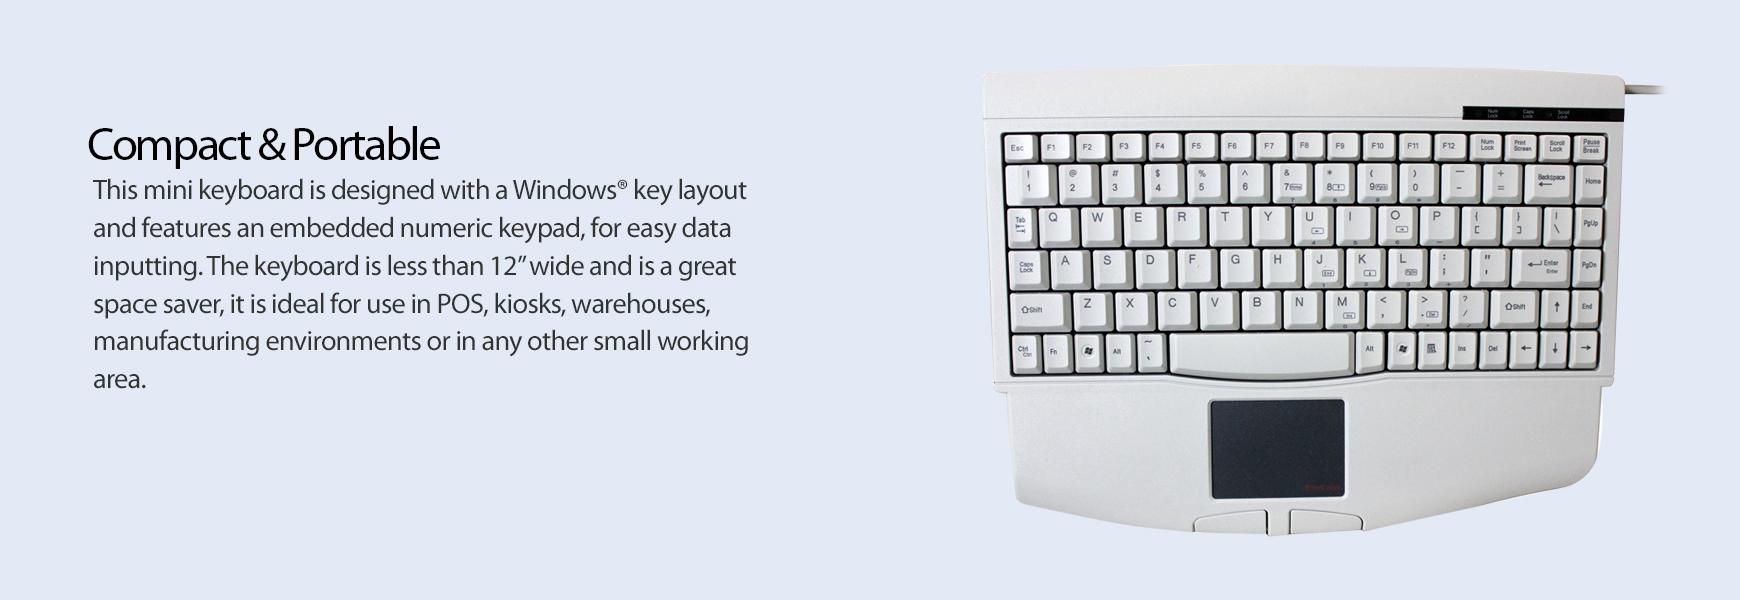 ACK-540UW - Mini Touchpad Keyboard (White)